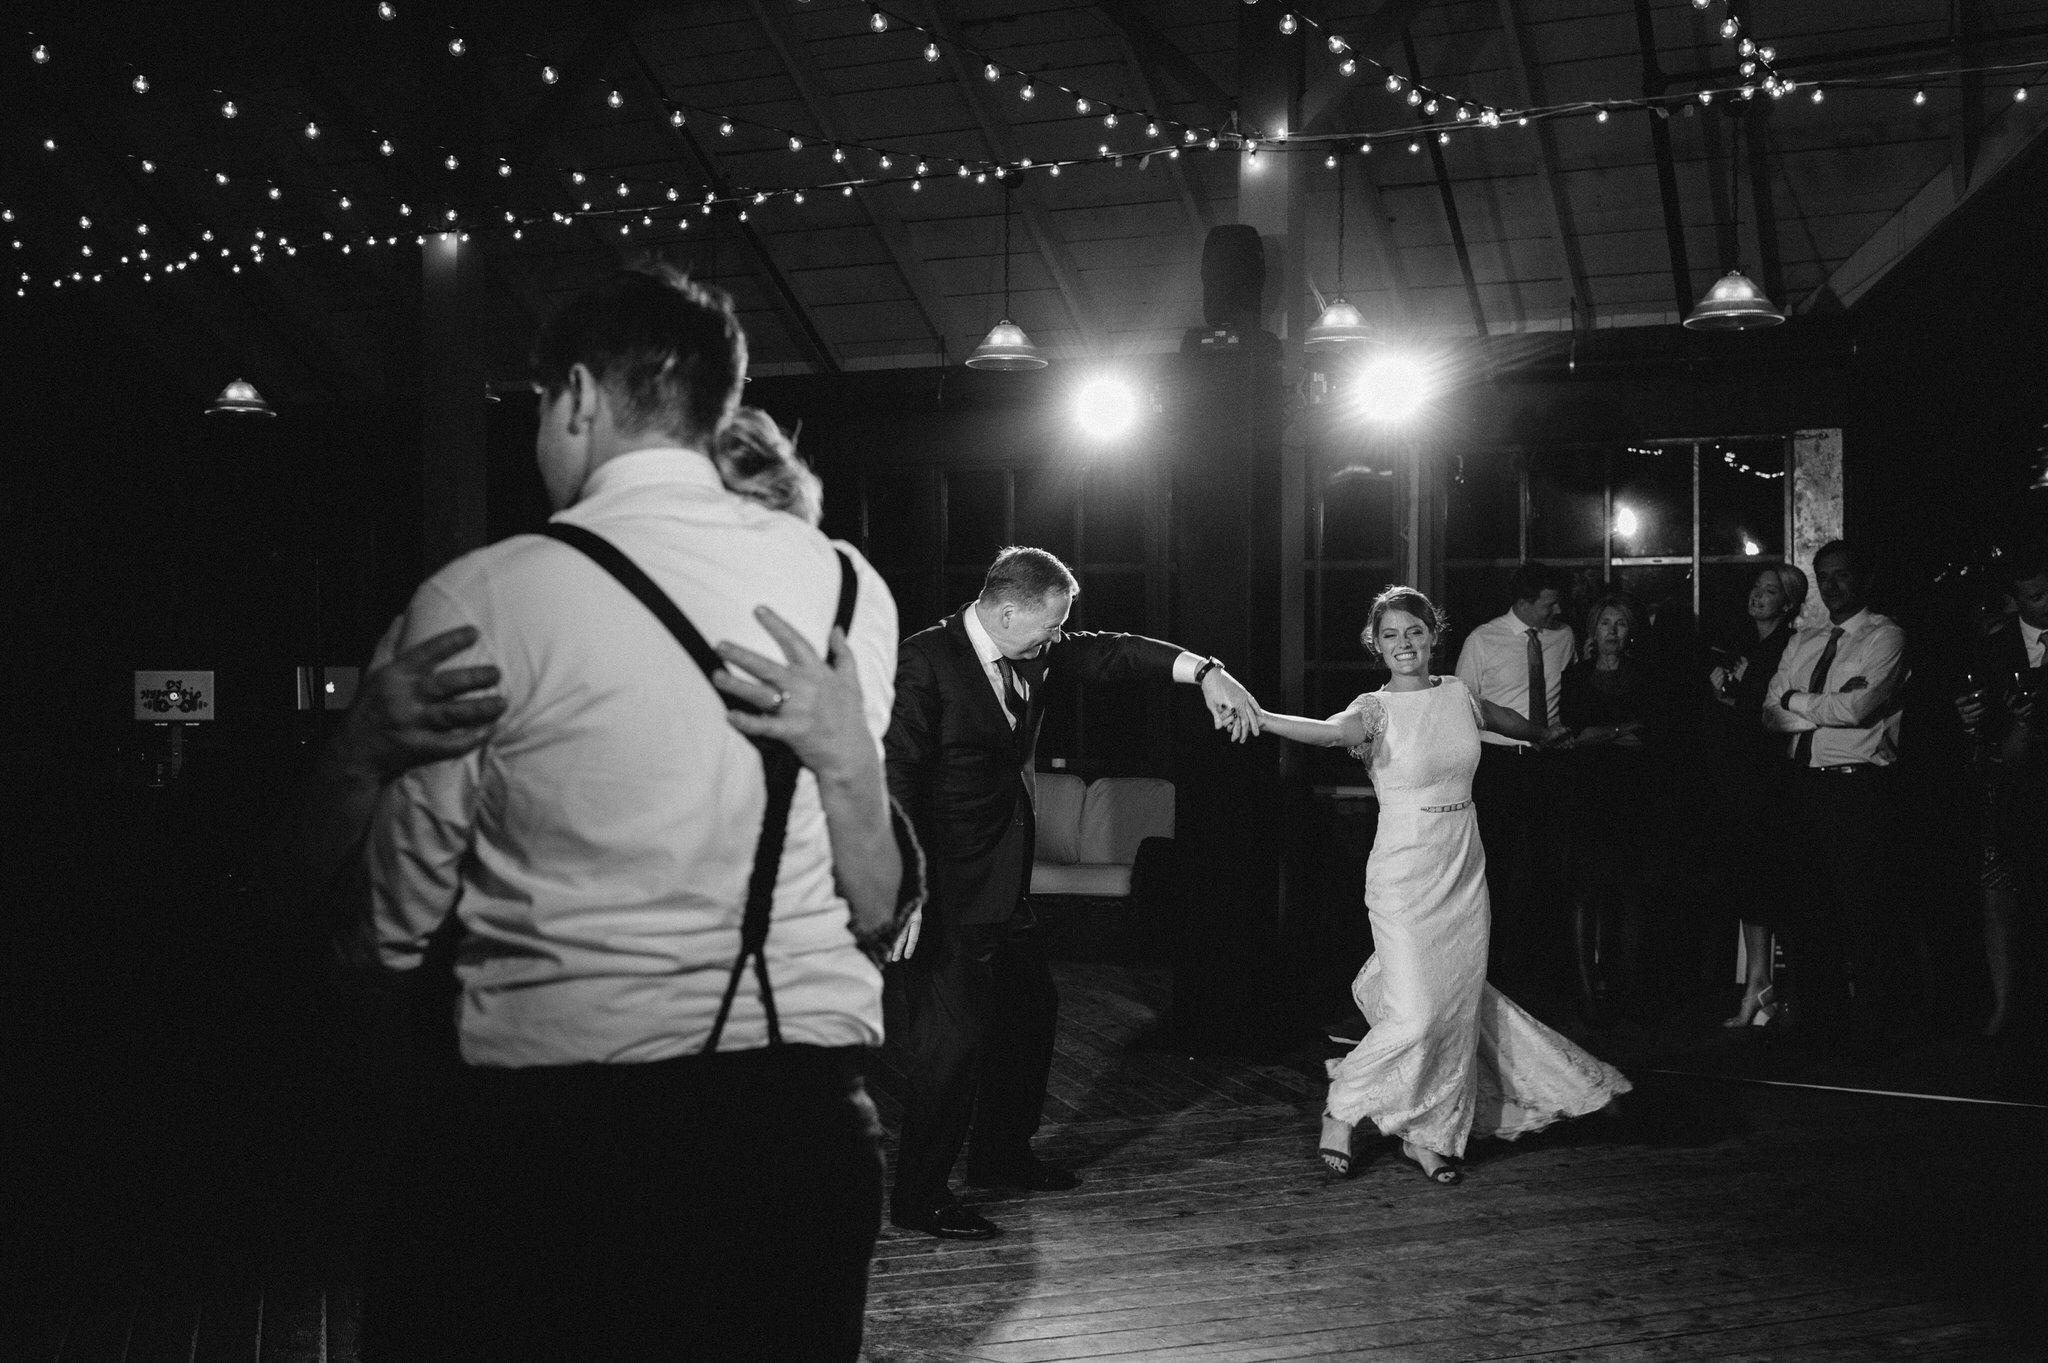 scarletoneillphotography_weddingphotography_prince edward county weddings178.JPG